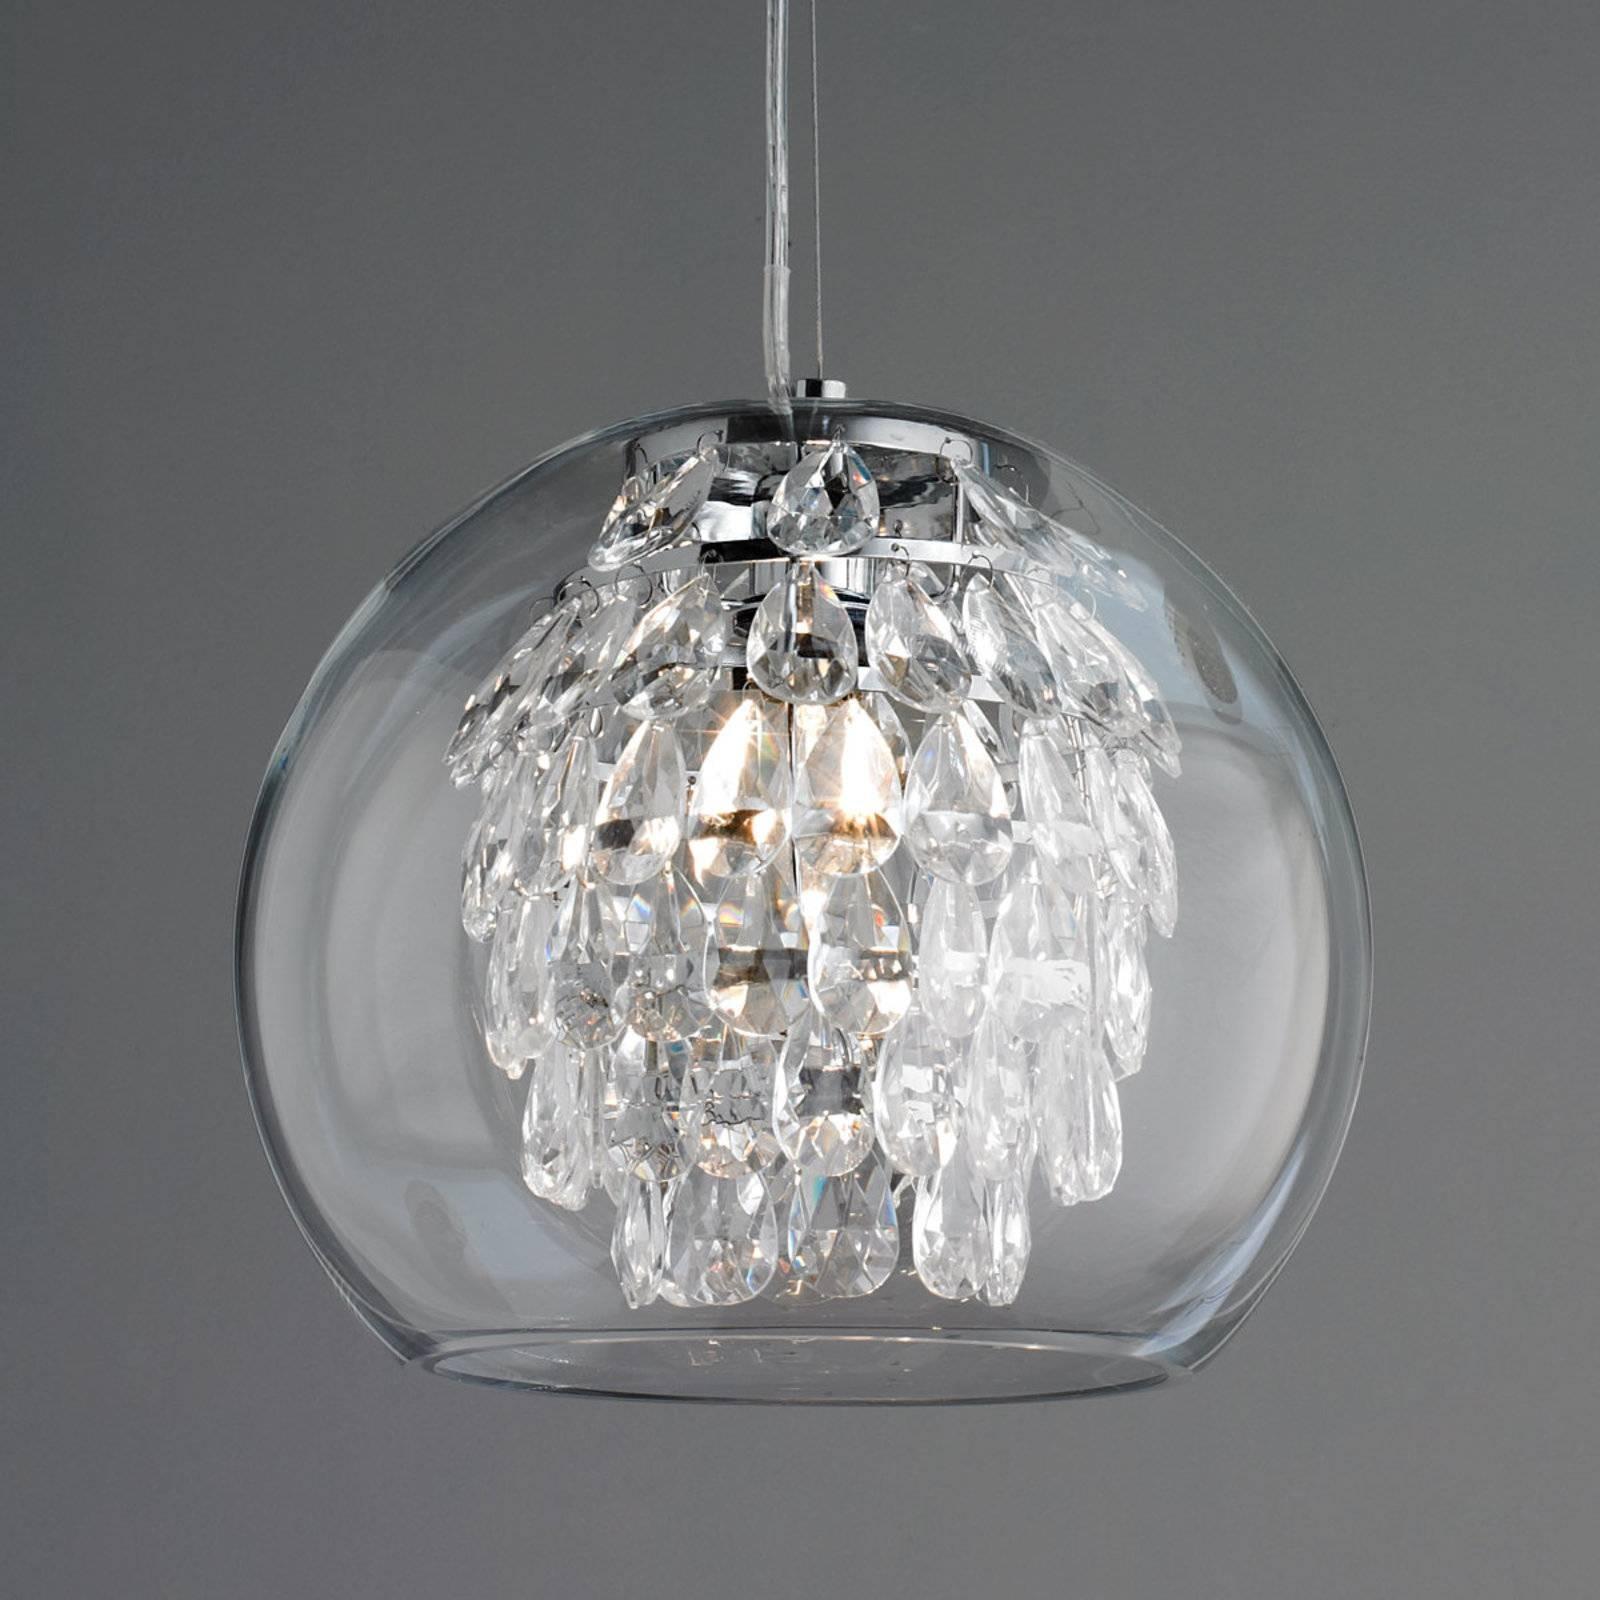 Lamp : Glass Sphere Chandelier Large Glass Globe Pendant Light Fan Pertaining To Glass Ball Pendant Lights (View 9 of 15)